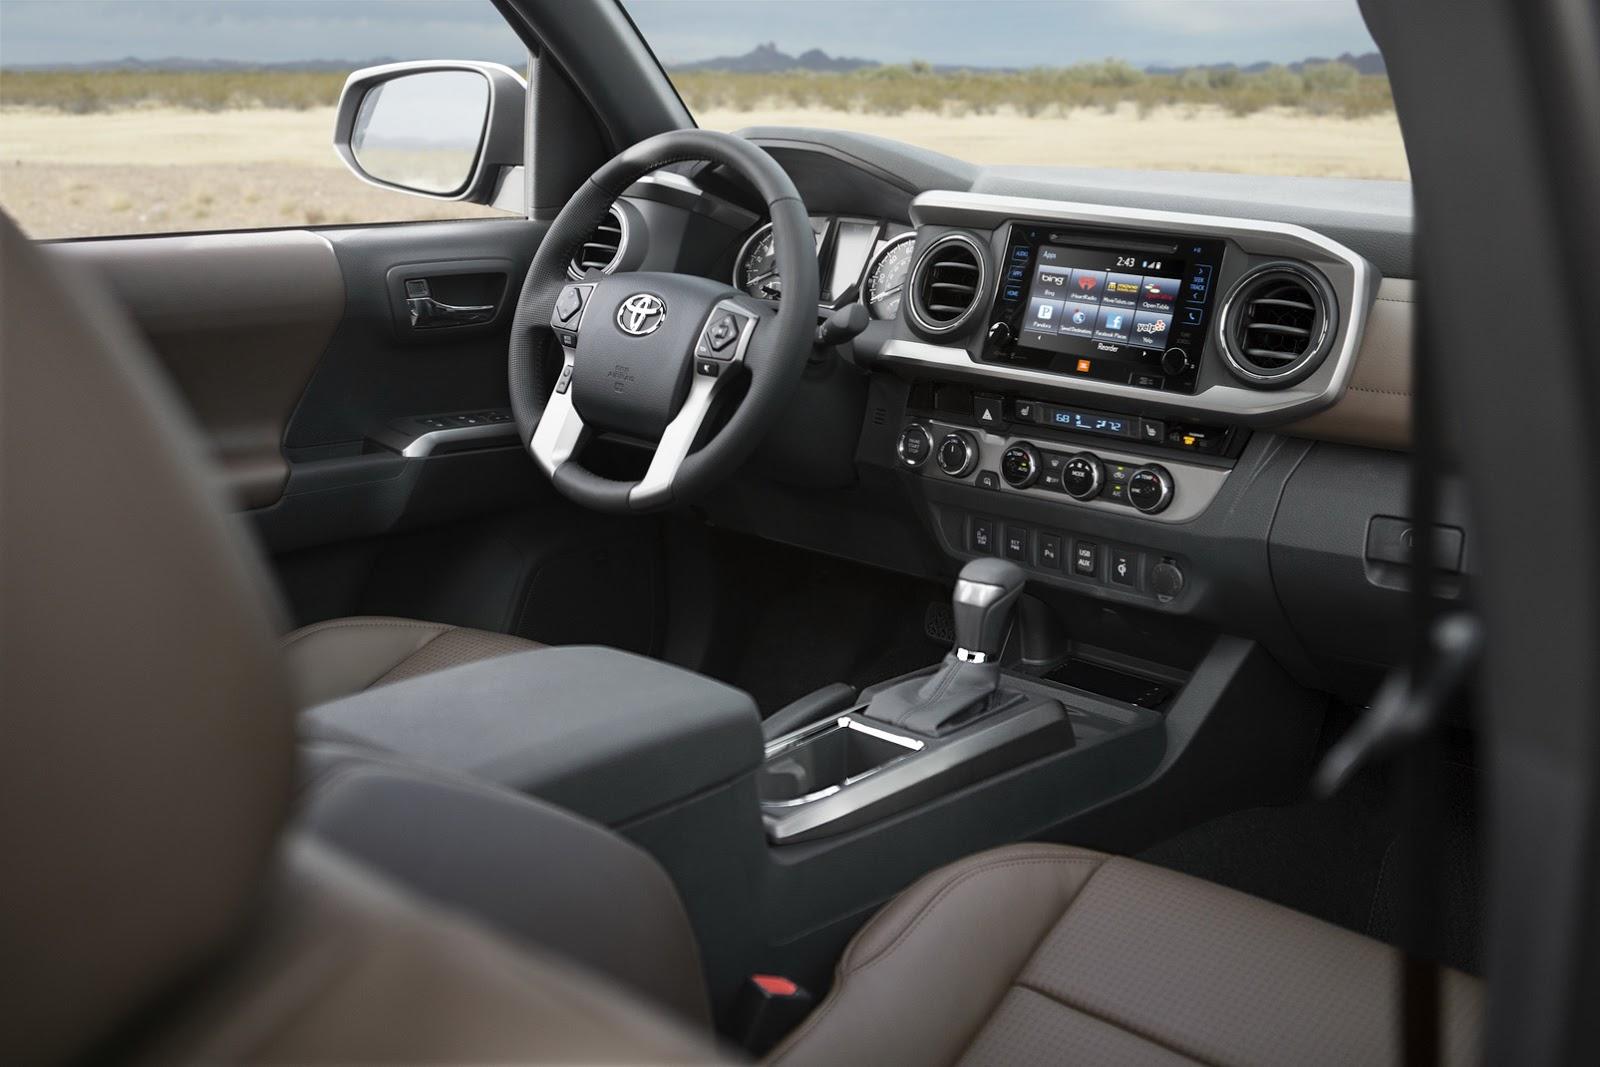 2016 Toyota Tacoma news - Page 8 - ClubLexus - Lexus Forum ...